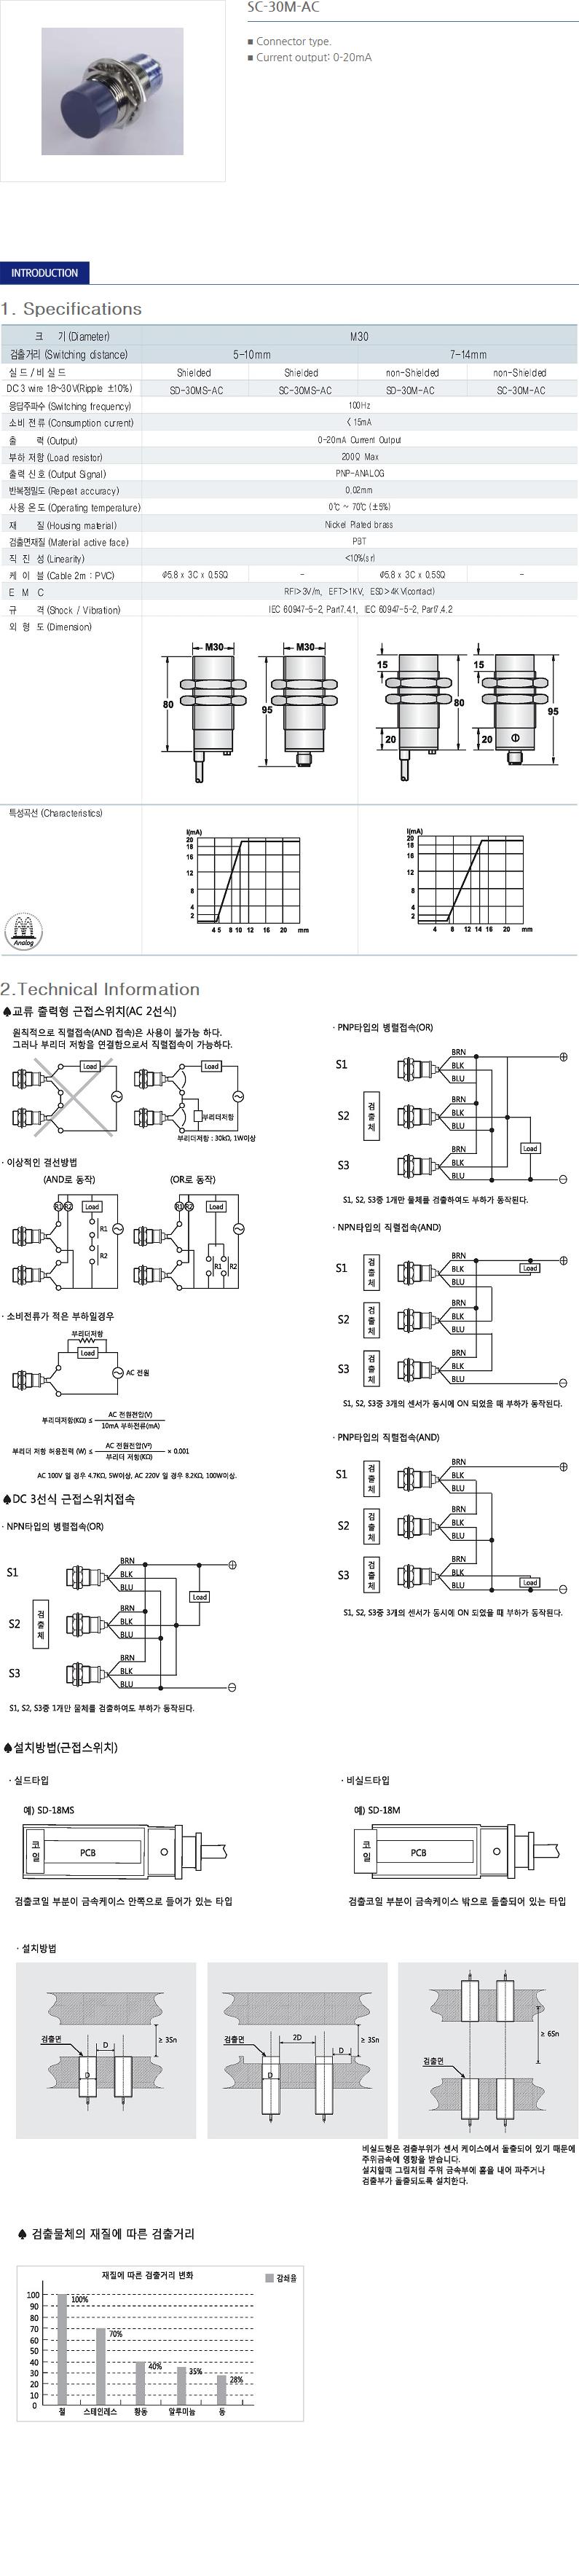 SANIL DC Analog Type Proximity Sensor